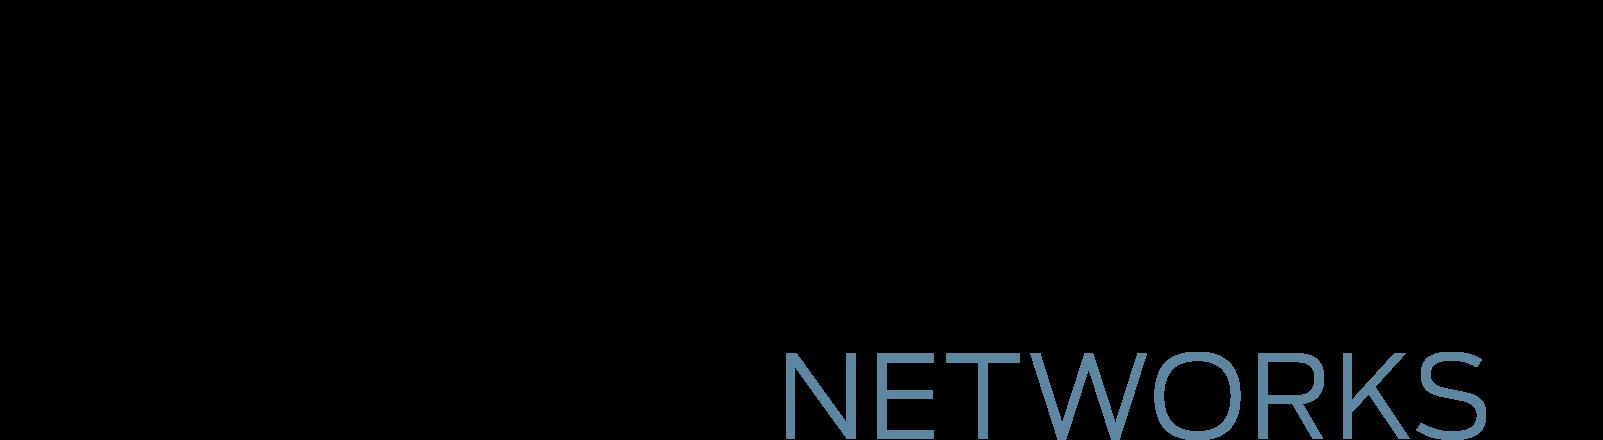 MPLS + SDN + NFV World Congress 2018: Agenda Day 2 Track 1